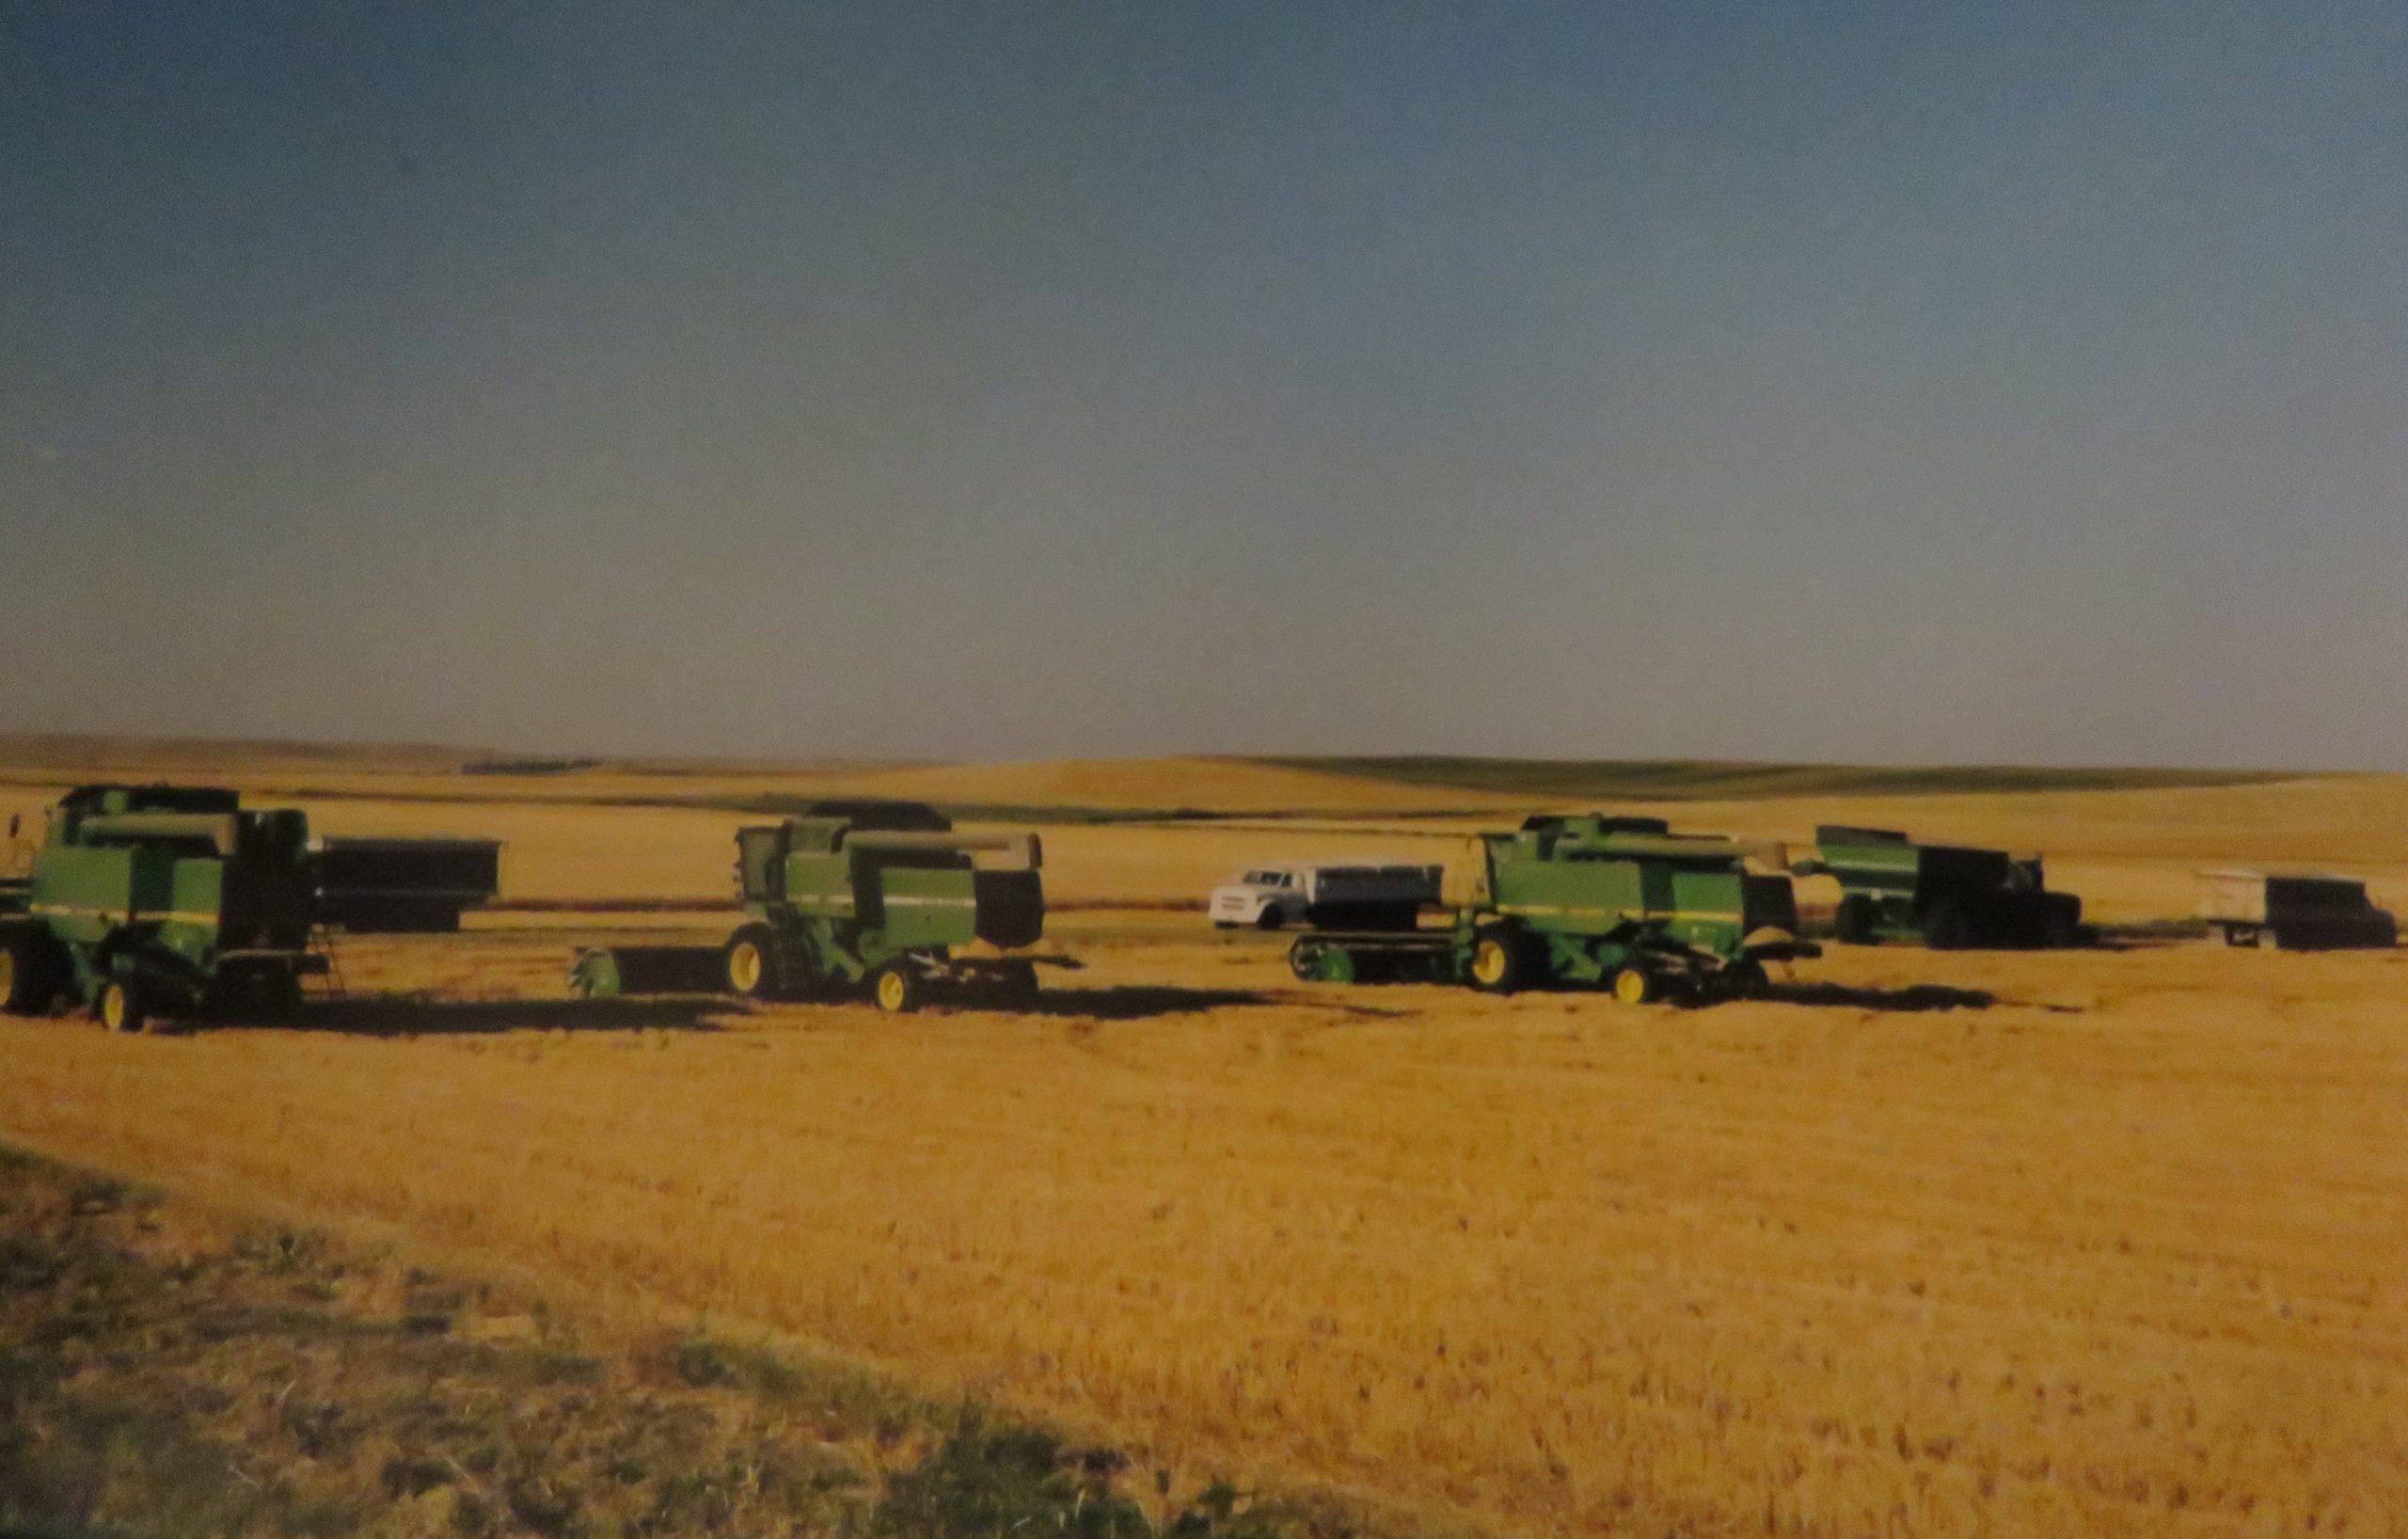 Vanderbrink - Krinke Collection - Farm equipment in the pasture